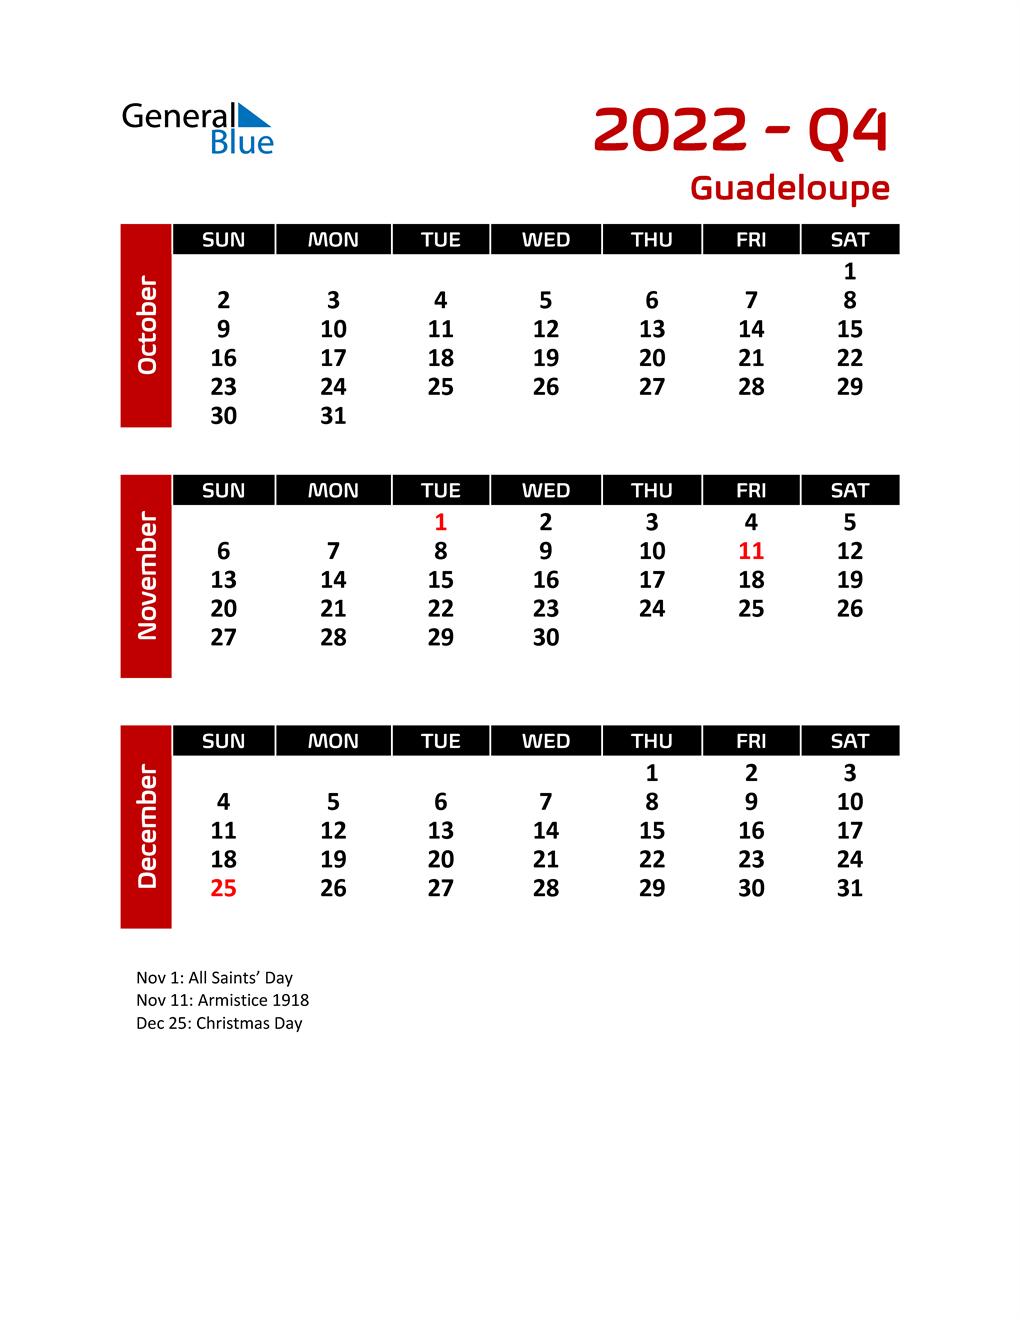 Q4 2022 Calendar with Holidays